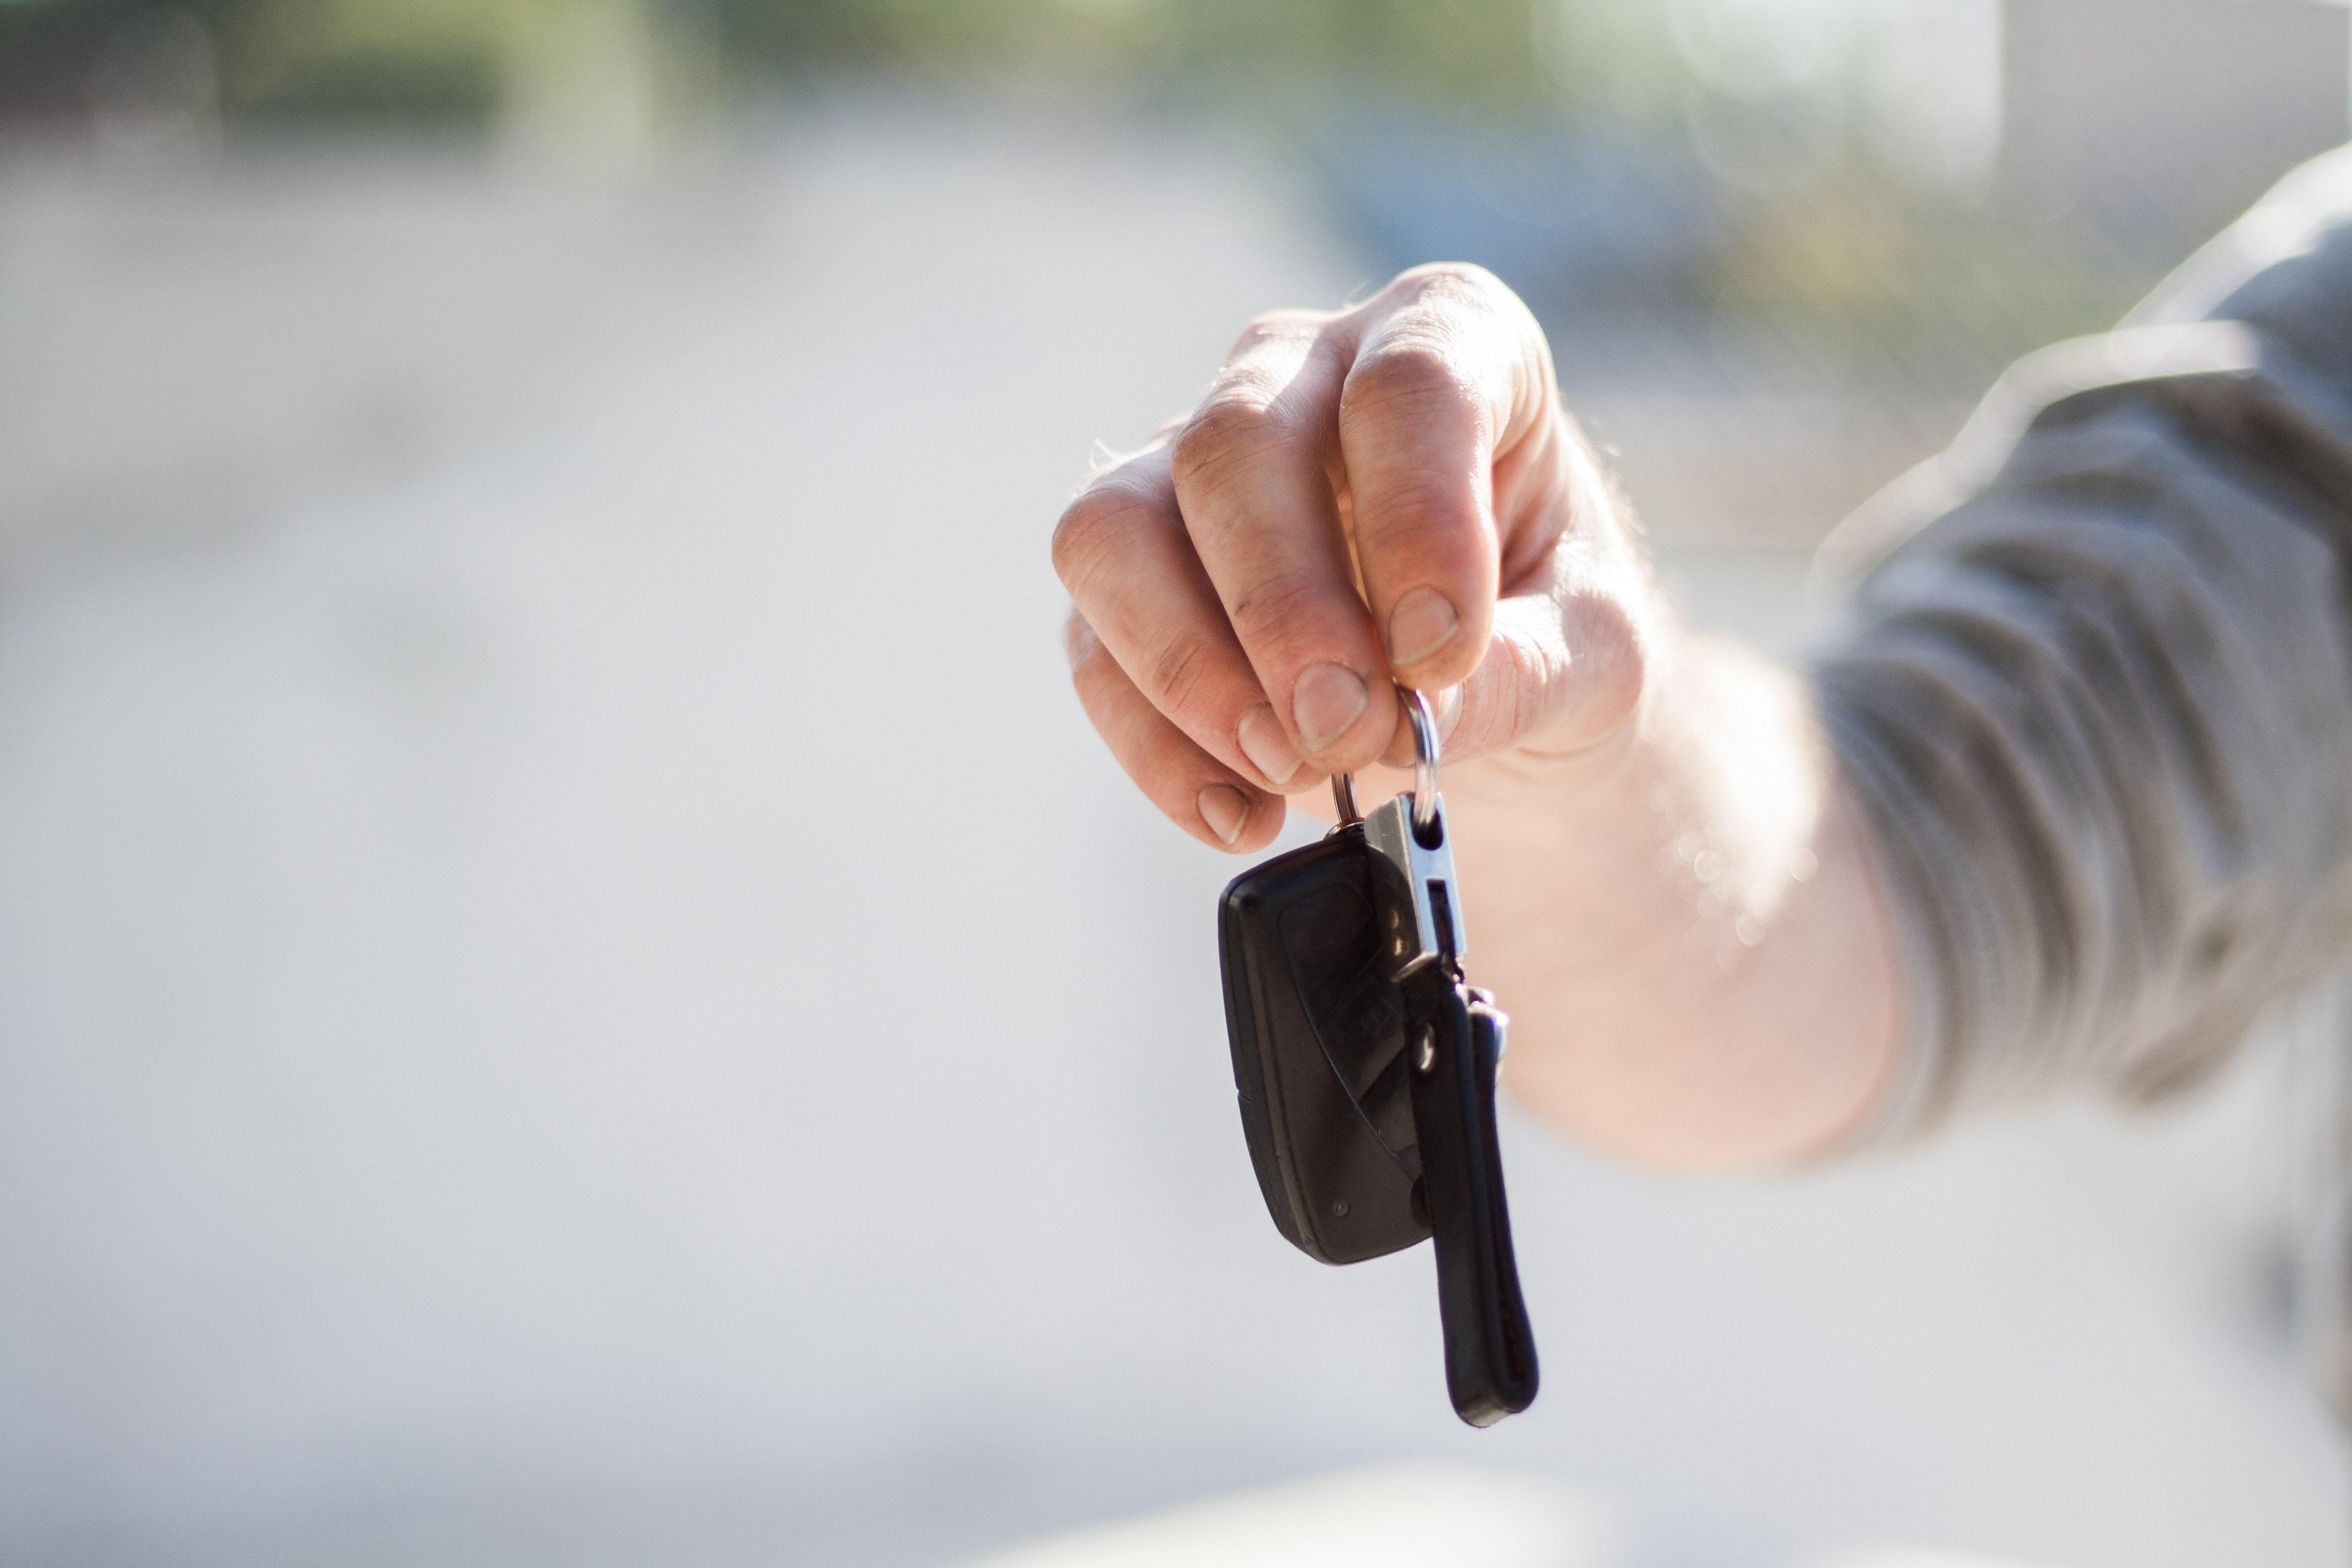 car-buying-car-key-car-purchase-97079.jpg